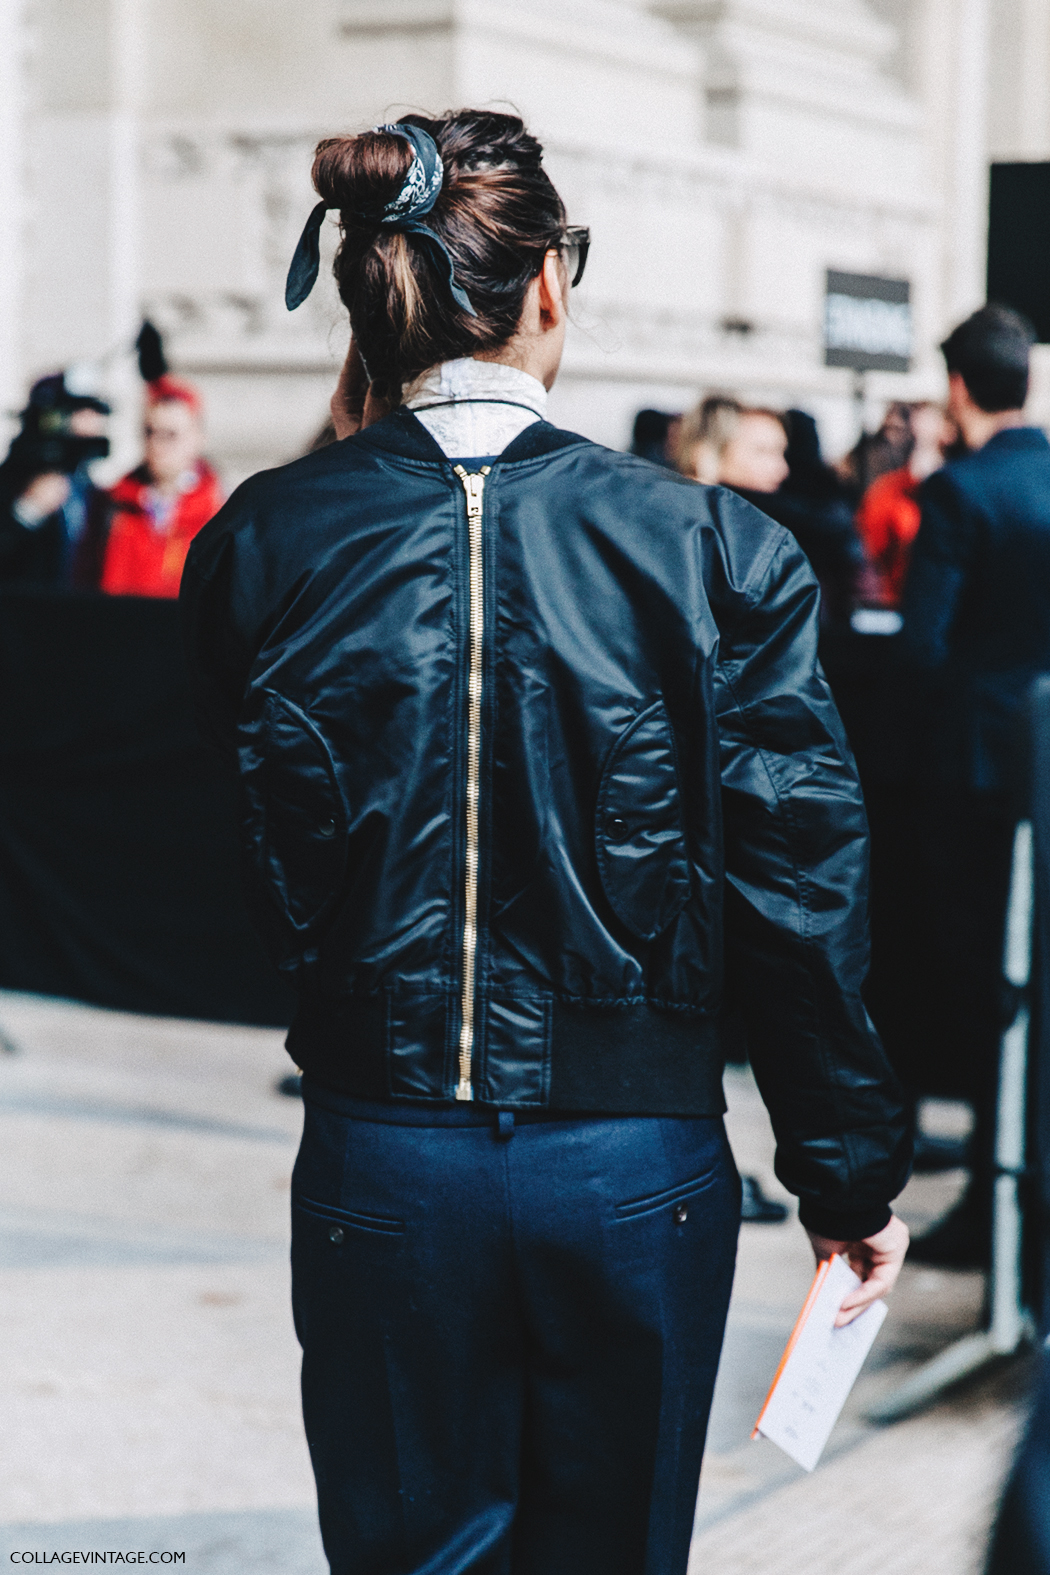 PFW-Paris_Fashion_Week_Fall_2016-Street_Style-Collage_Vintage-Sara_Marija_Saric-Bomber-Lace-Vetements-